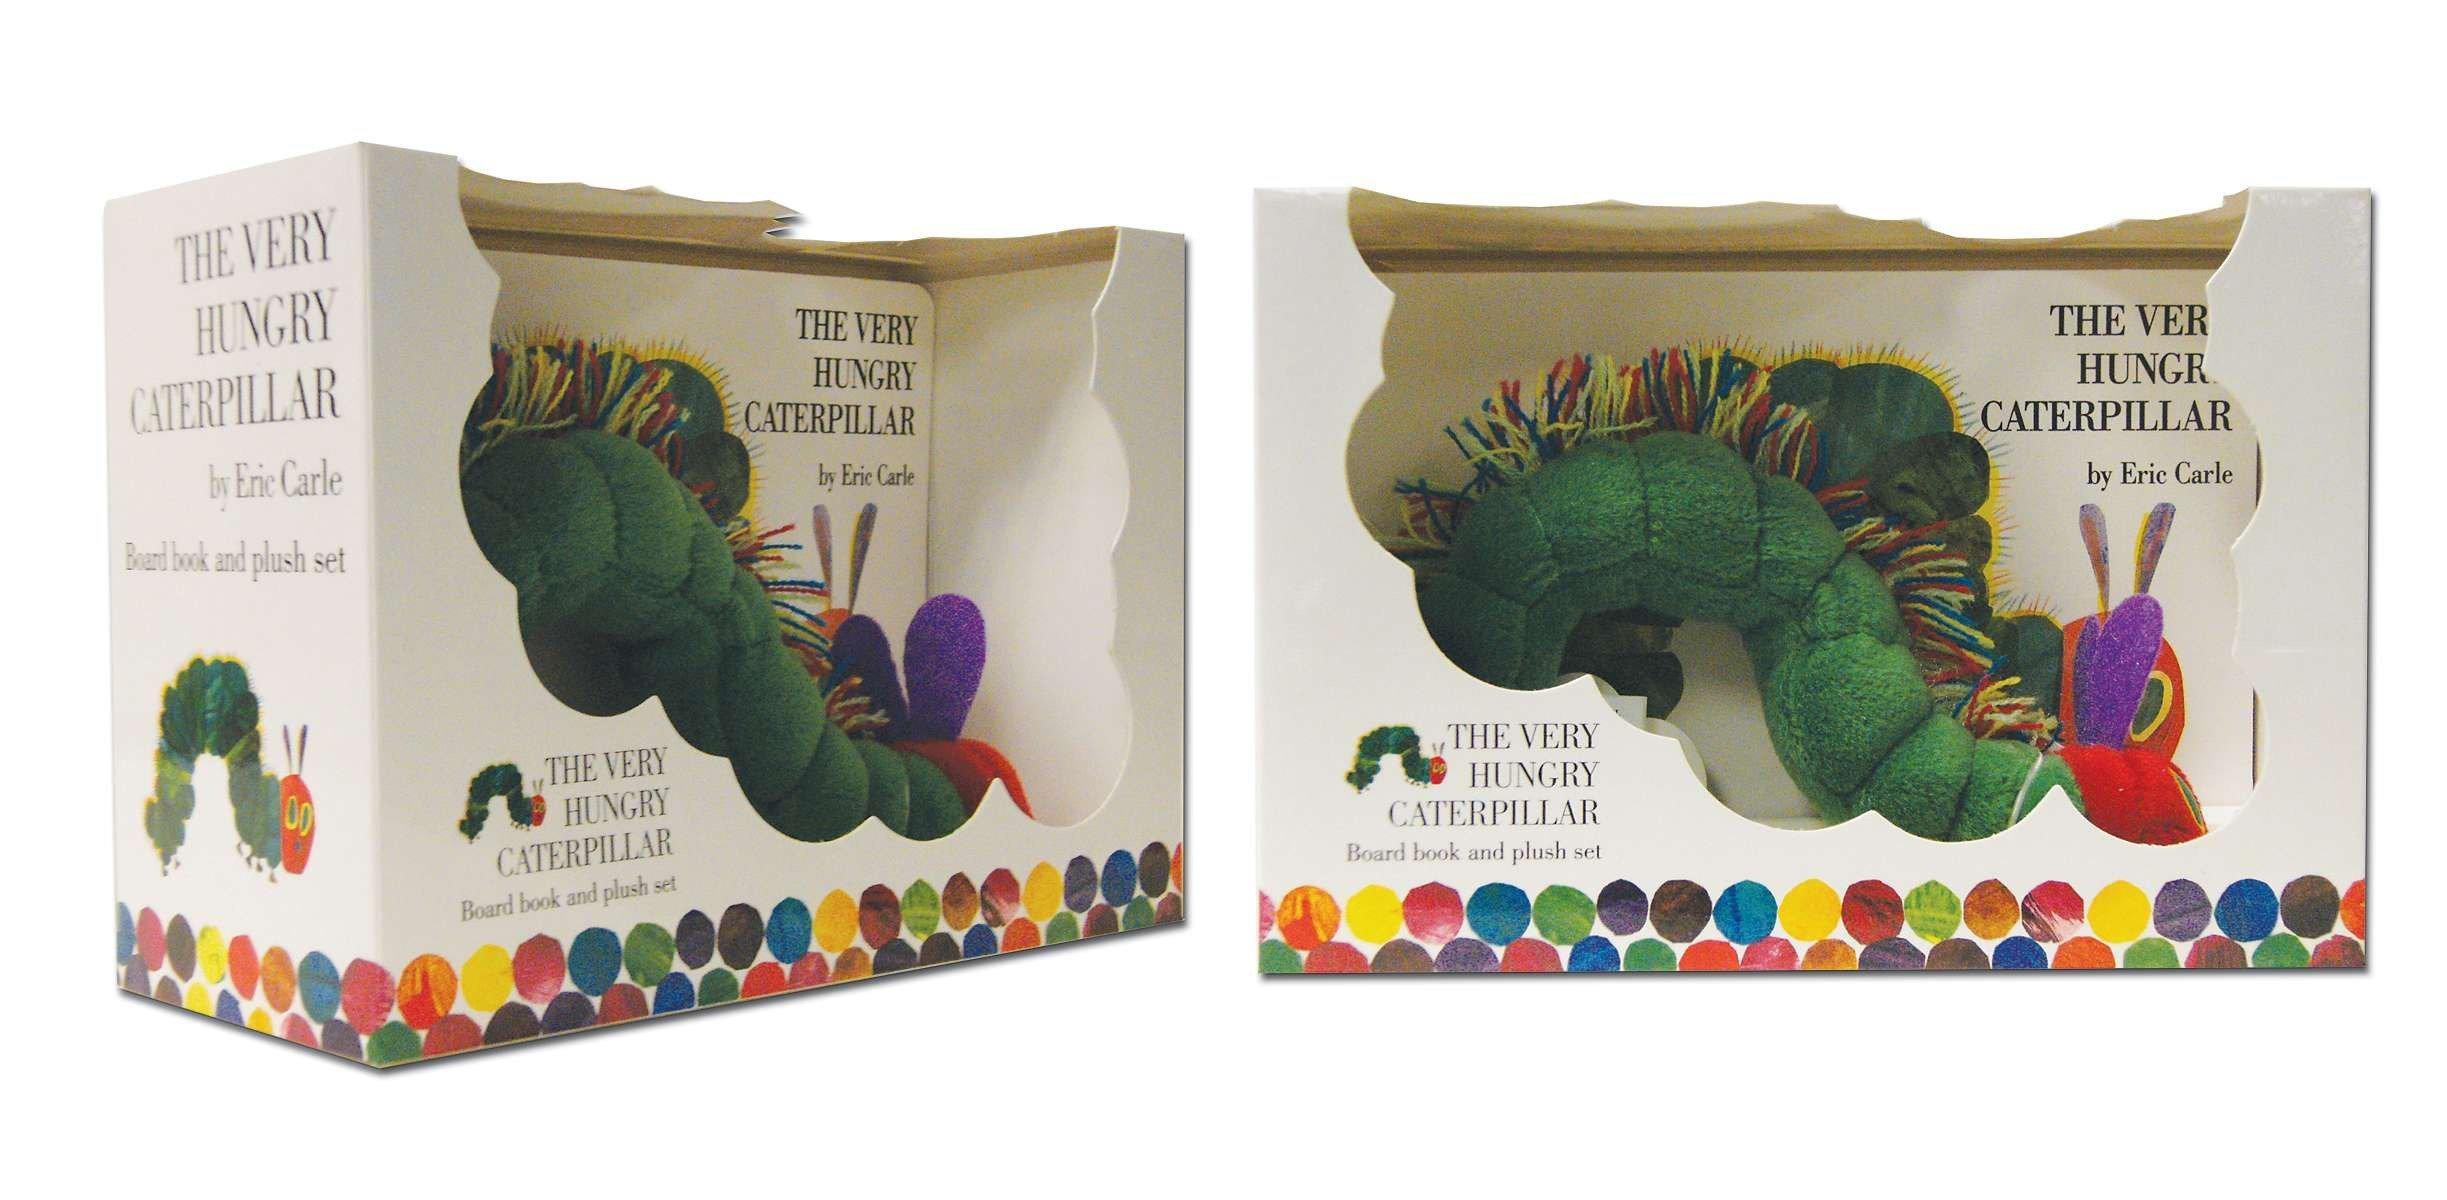 bc567b5cb5dfb Amazon.com  The Very Hungry Caterpillar Board Book and Plush ...